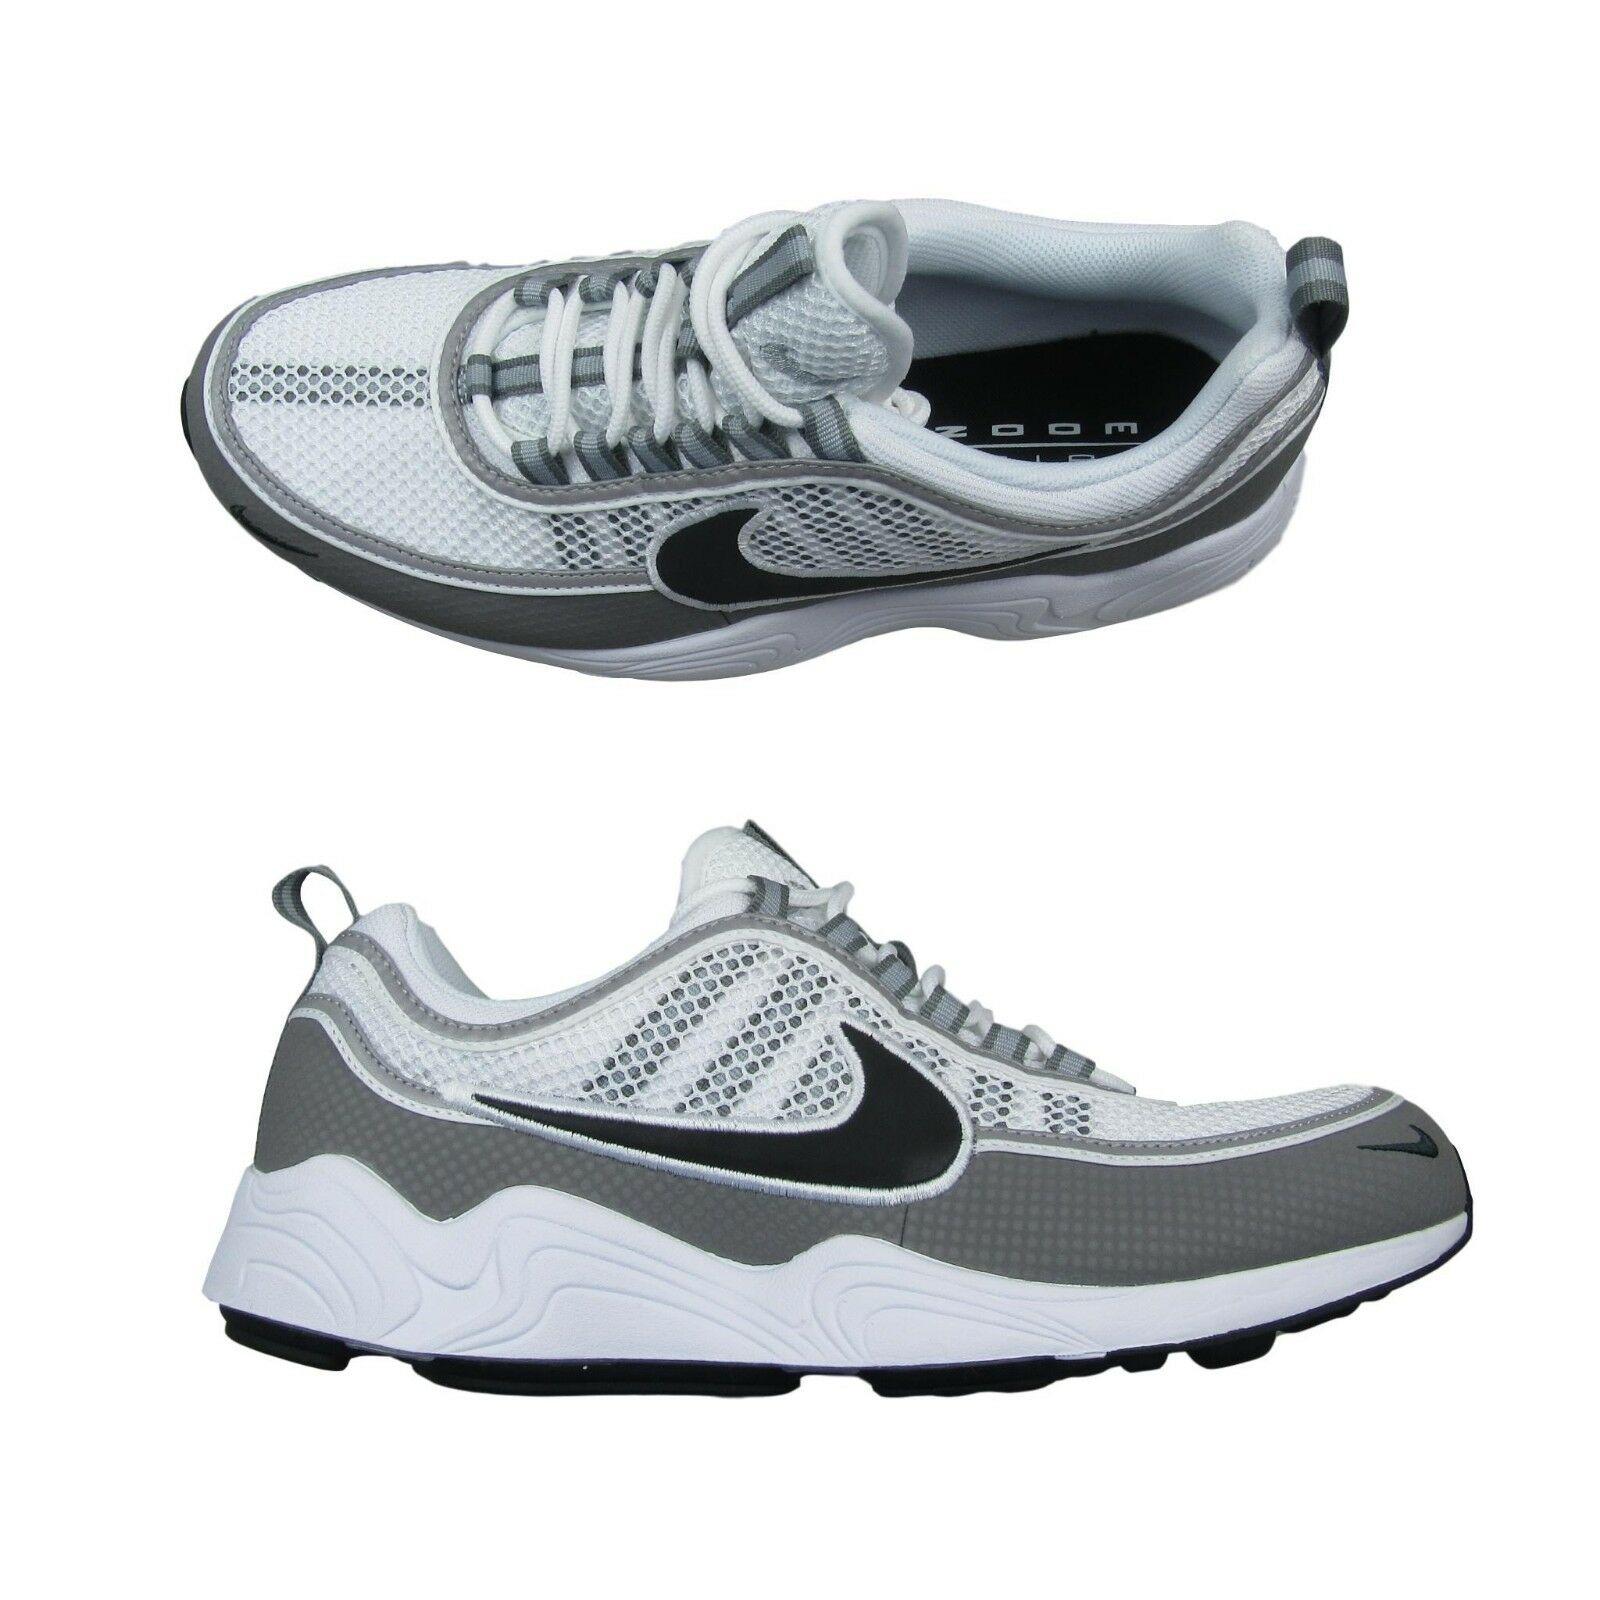 493df575a173 Nike Air Zoom Spiridon SP White Ash Gray Size 10.5 Mens Shoes 849776 ...